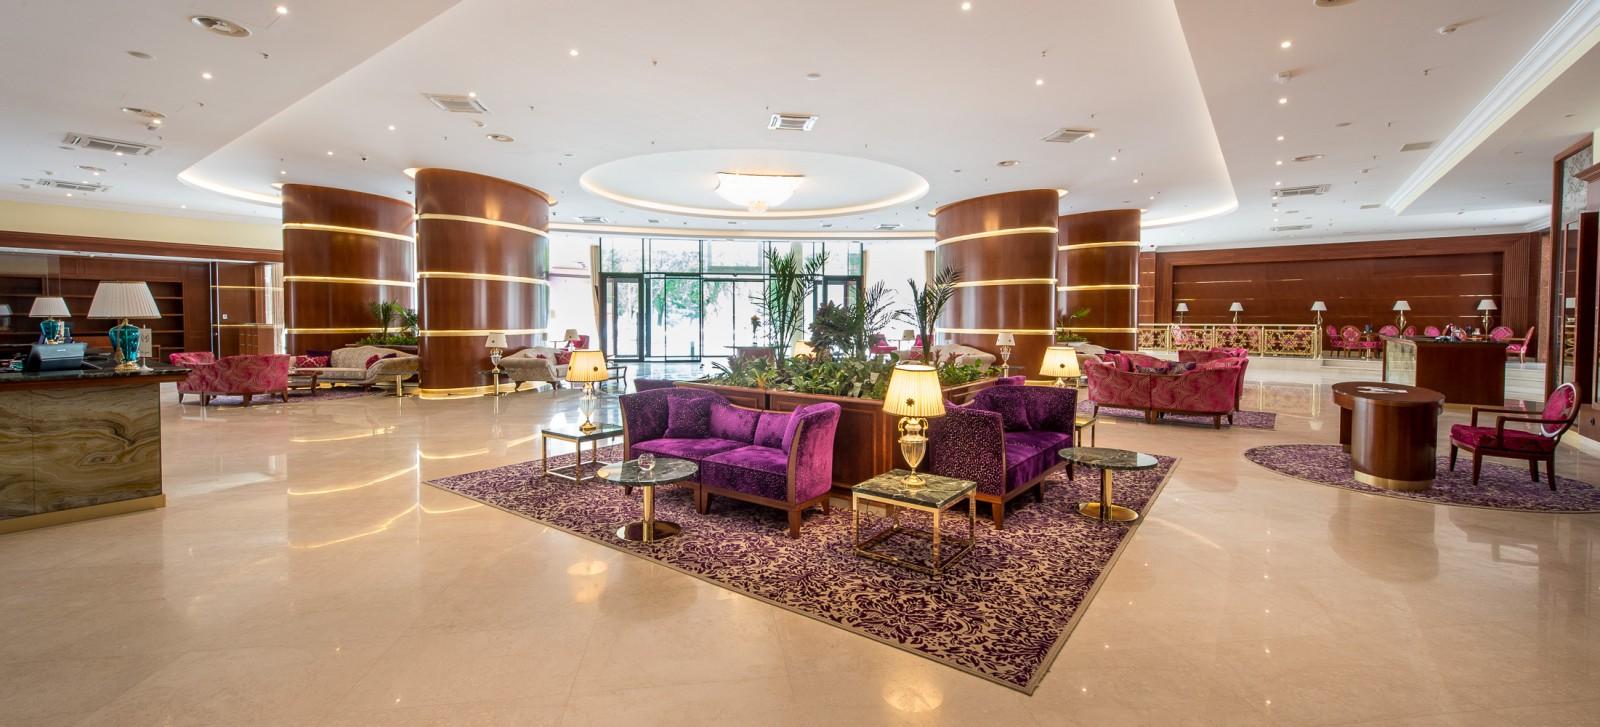 hotel-Mellain-Tuzla_oprema-javnega-dela_hotelske-sobe_oprema-hotela_hotel-furniture_lobby_restaurant_classic-furniture_04